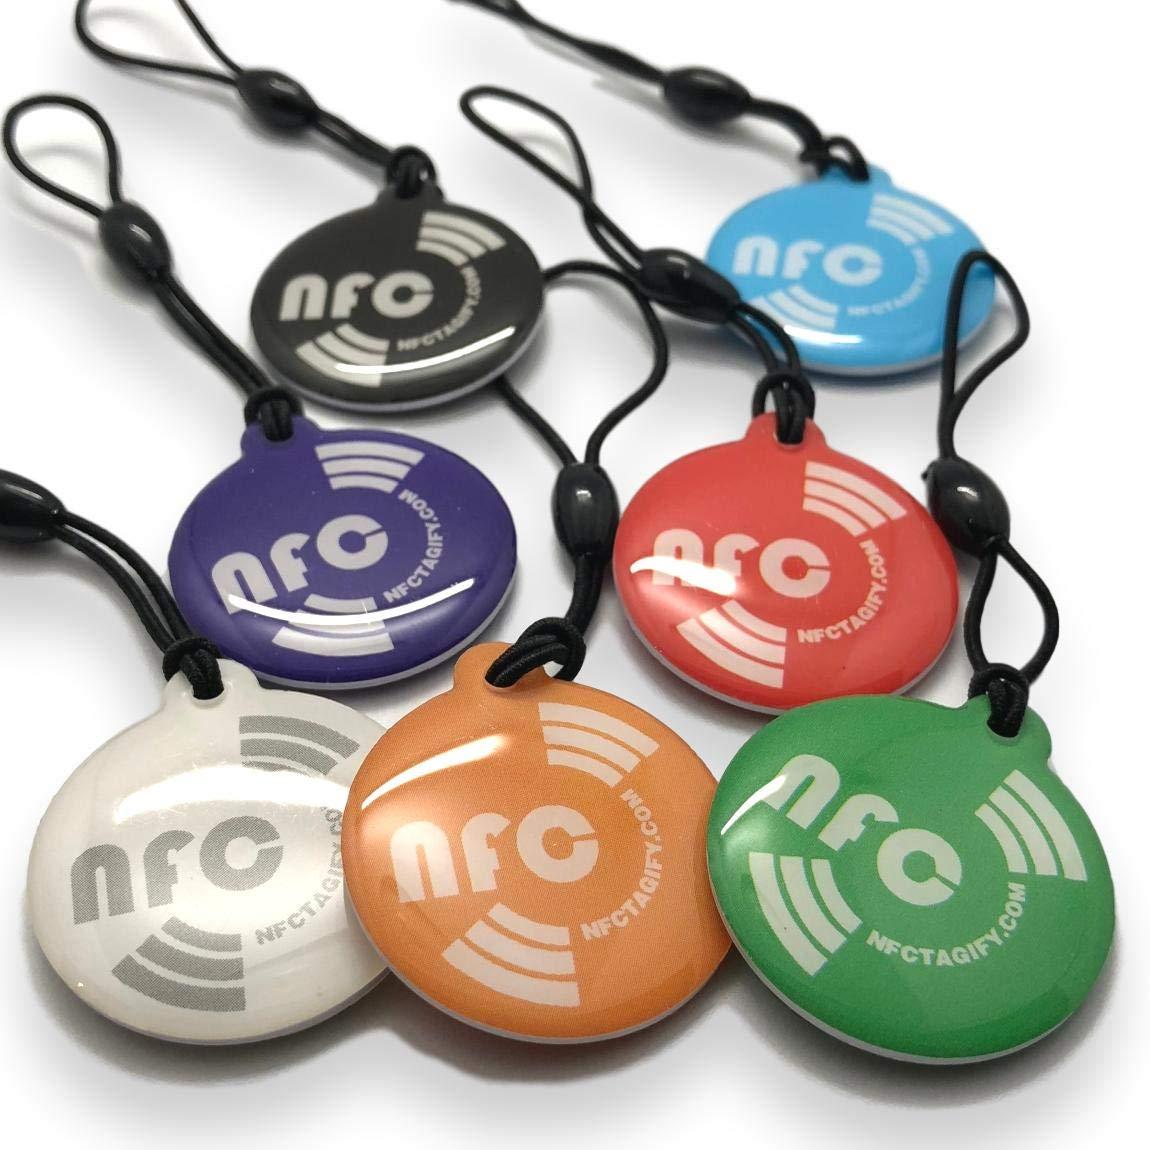 7 X NFC Tags | NXP Chip NTAG213 | memoria de 144 bytes | colores mezclados | colgar redondo | alta potencia de escaneo | Impermeable | Diseño elegante.